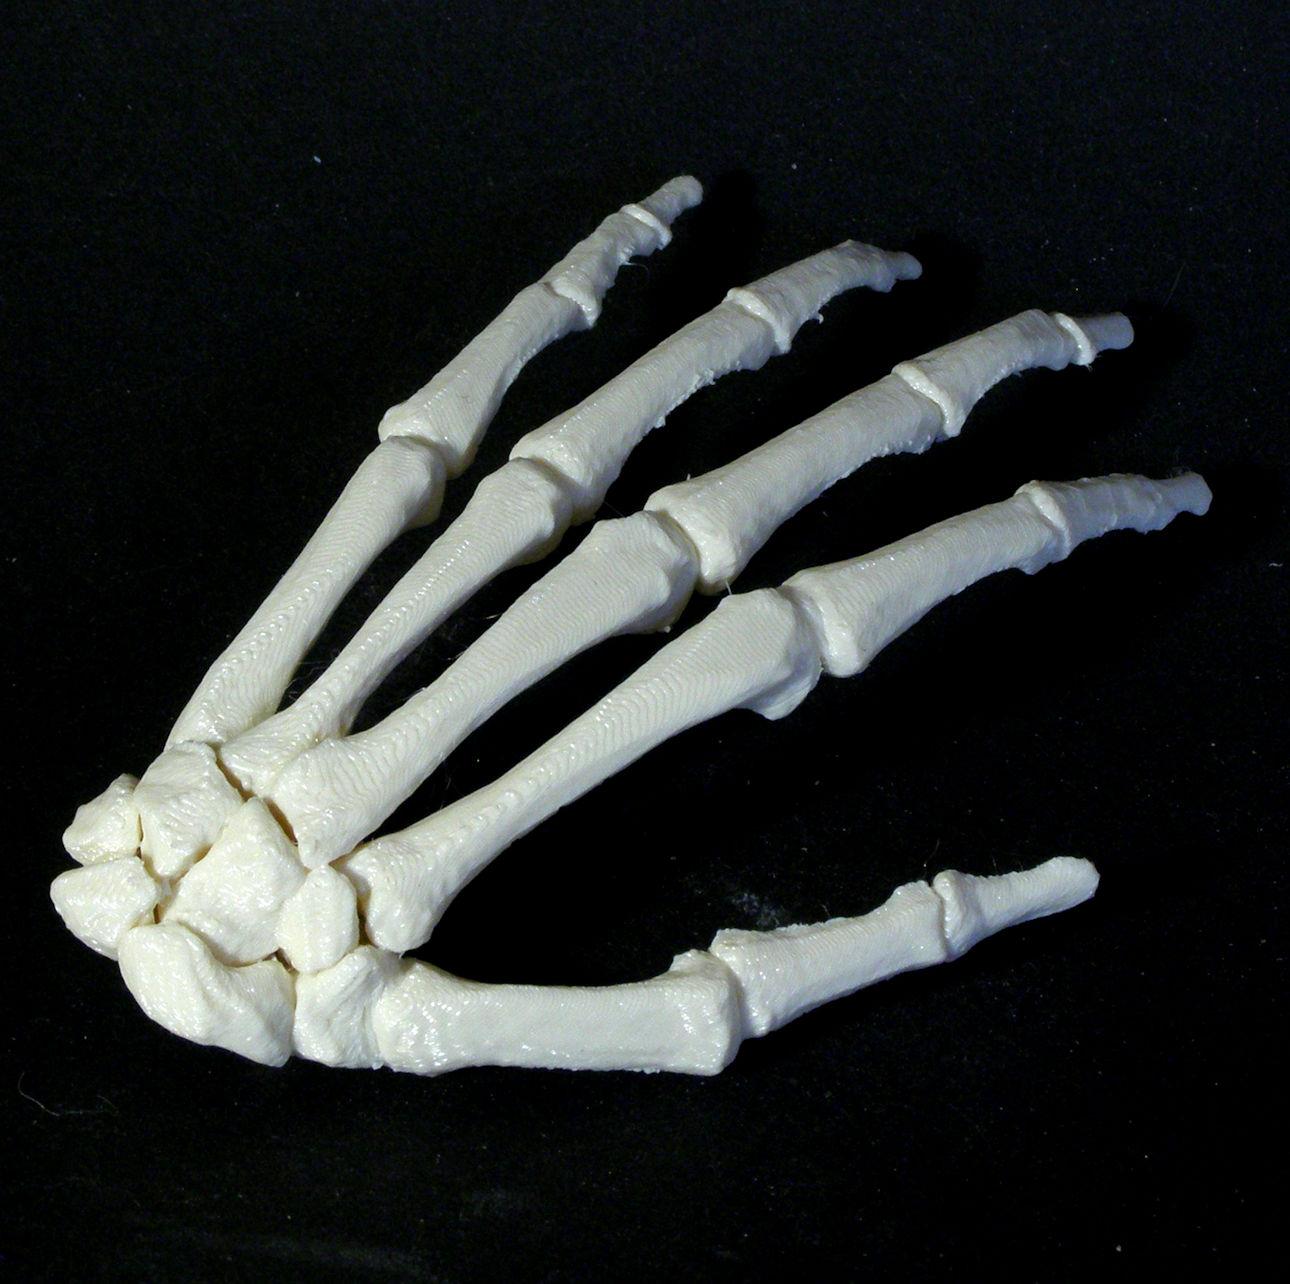 Bone - Hand - Left image